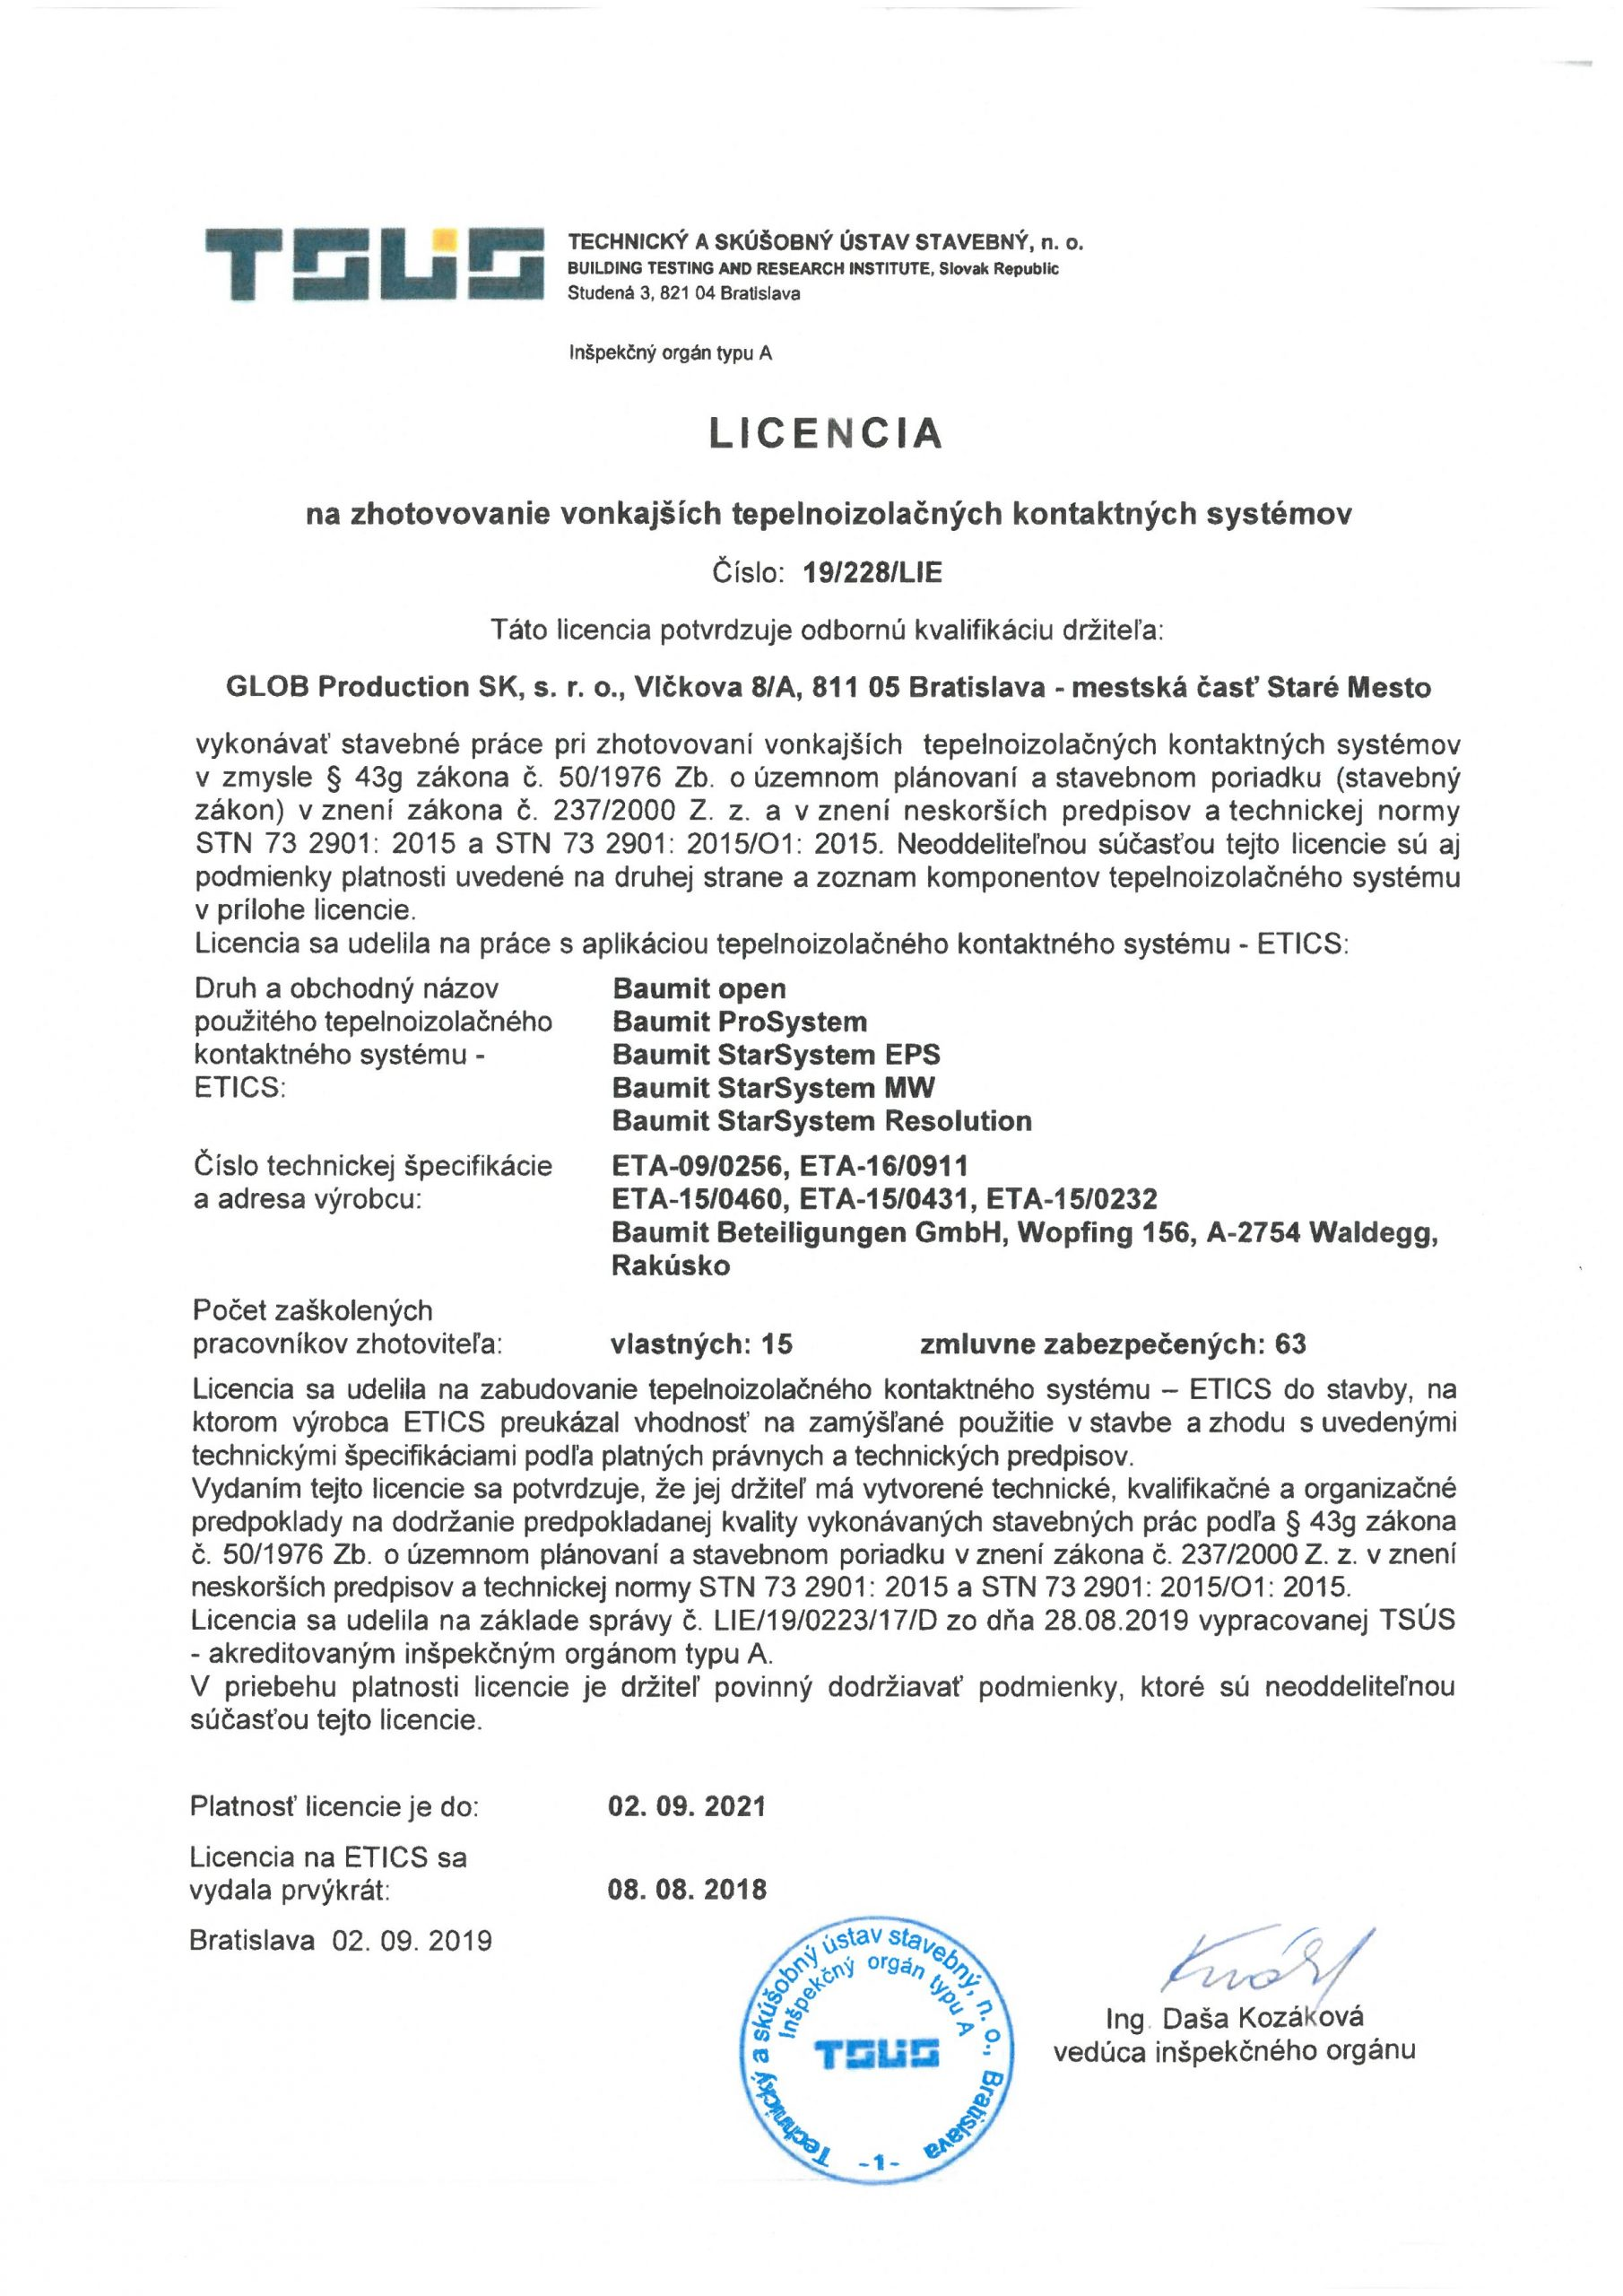 TSUS - Licencia BAUMIT